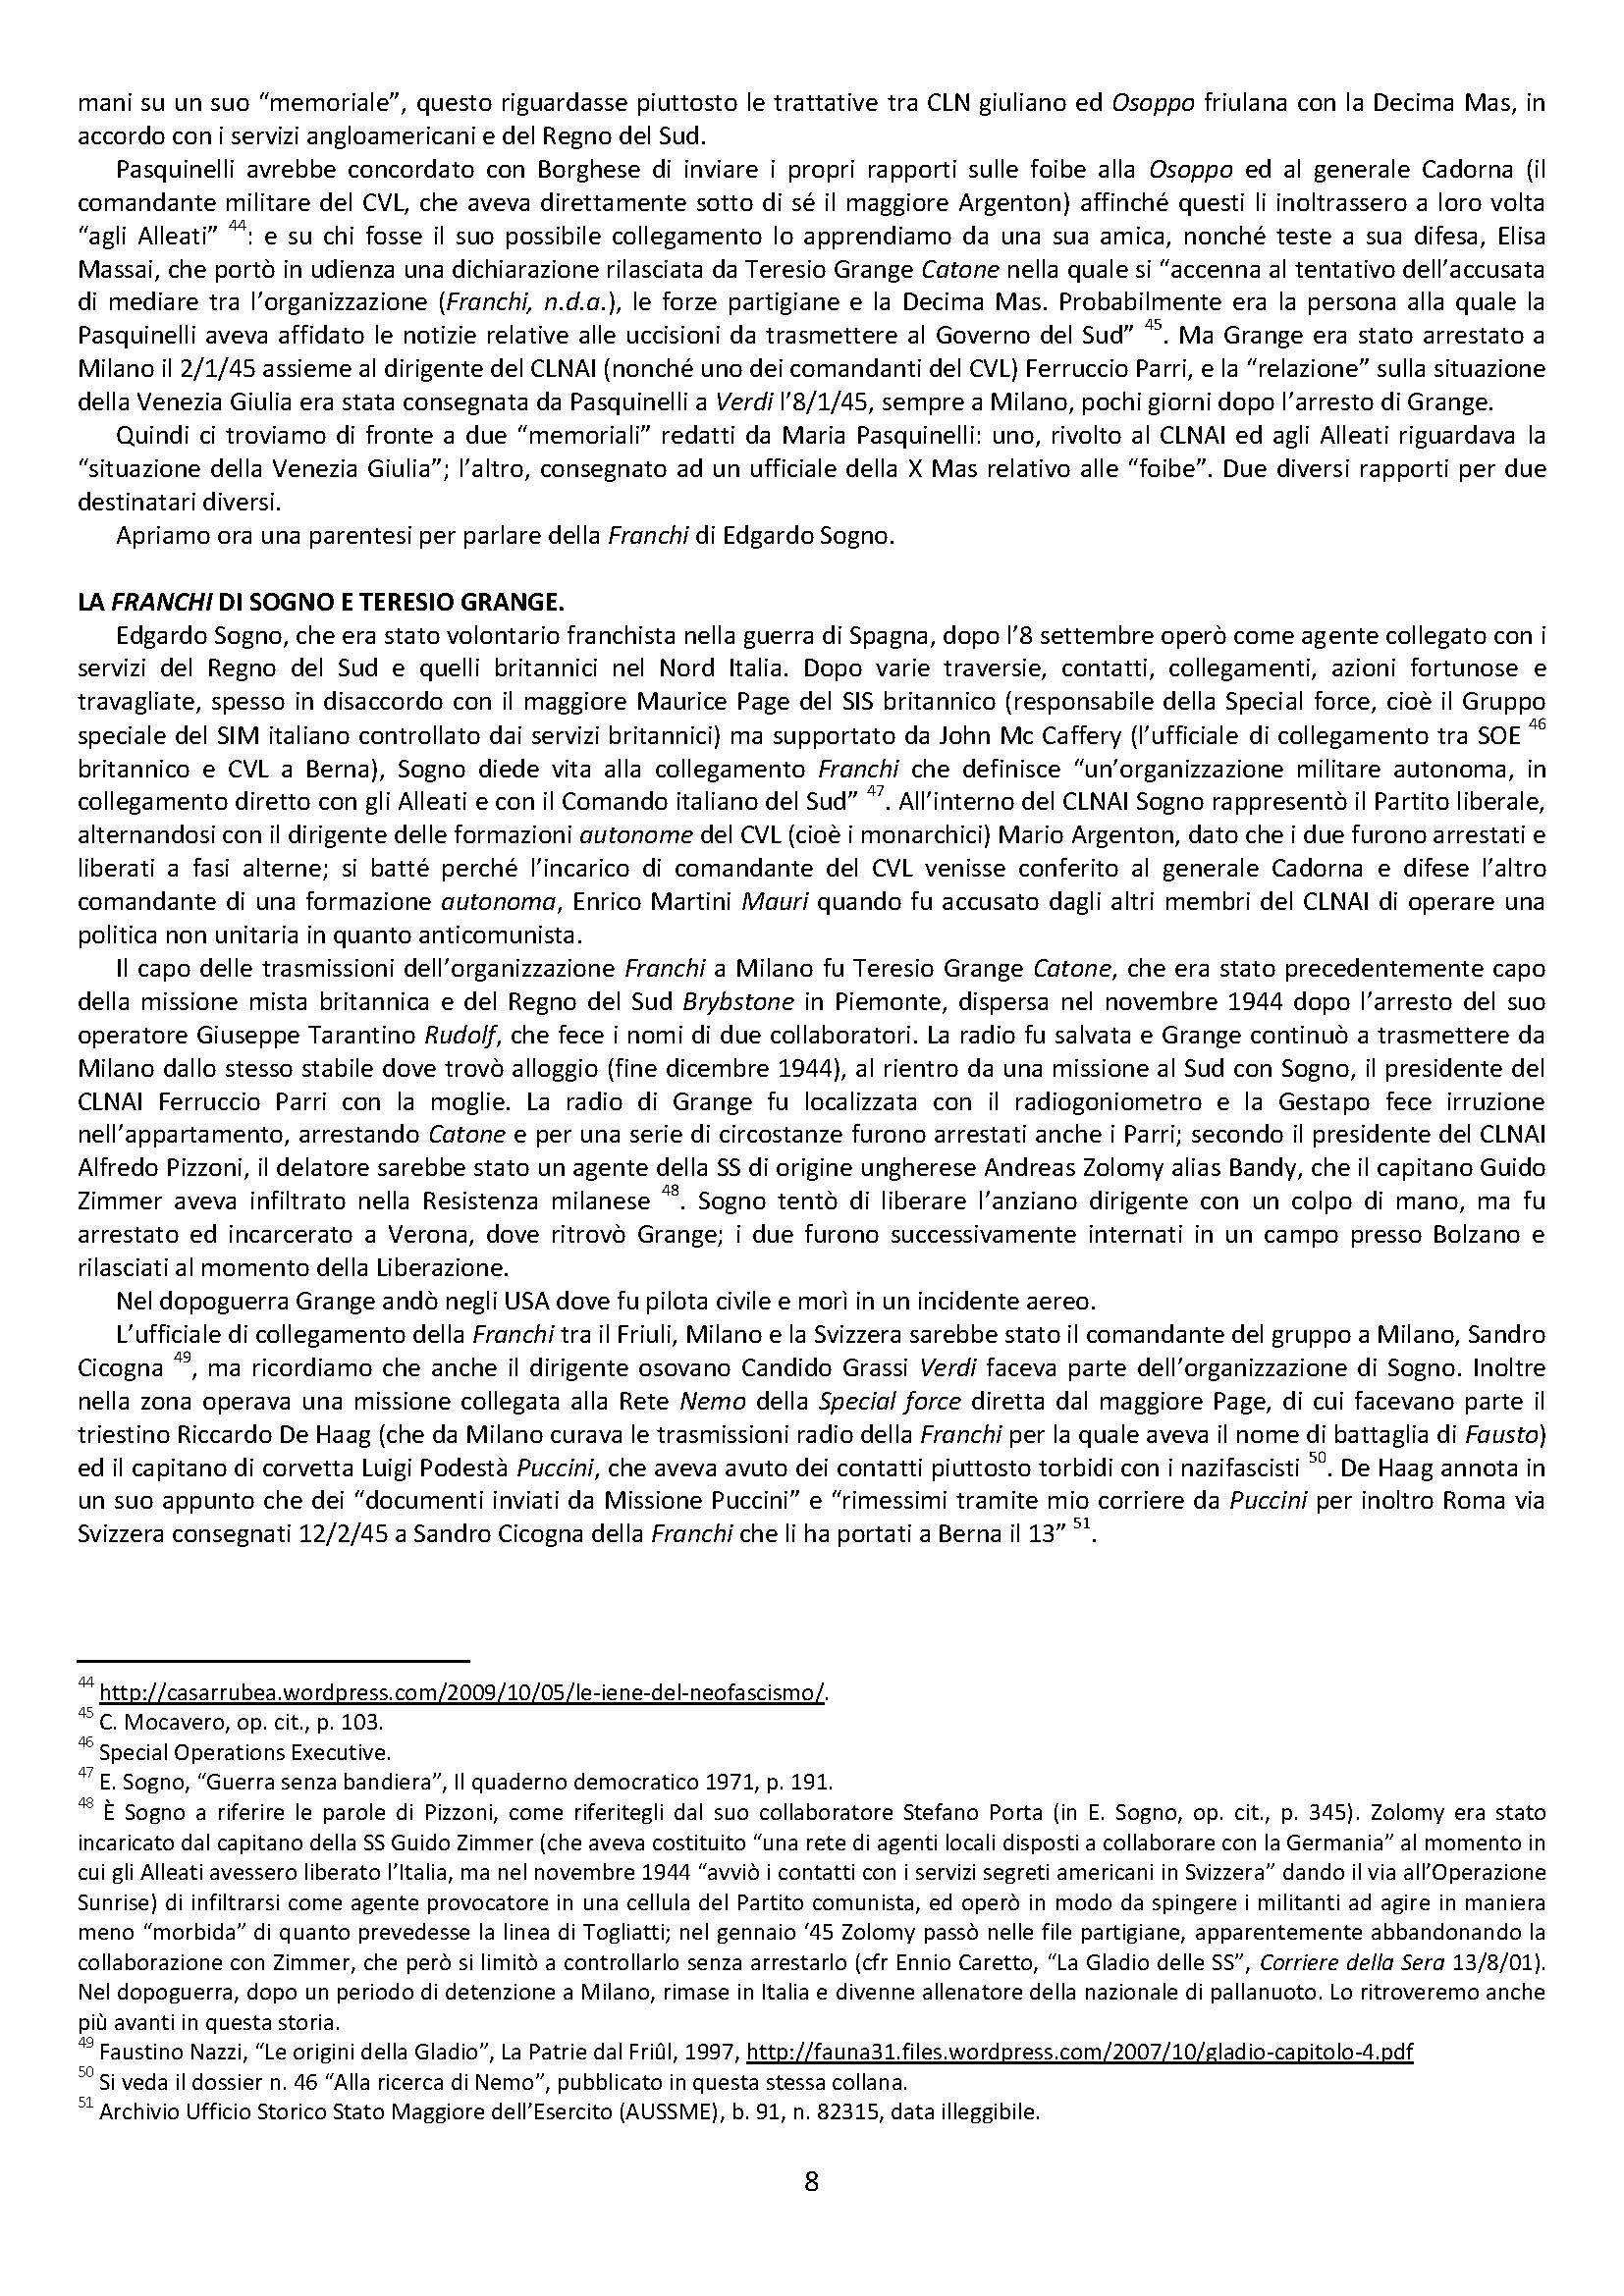 dossier-maria-pasquinelli_Page_08